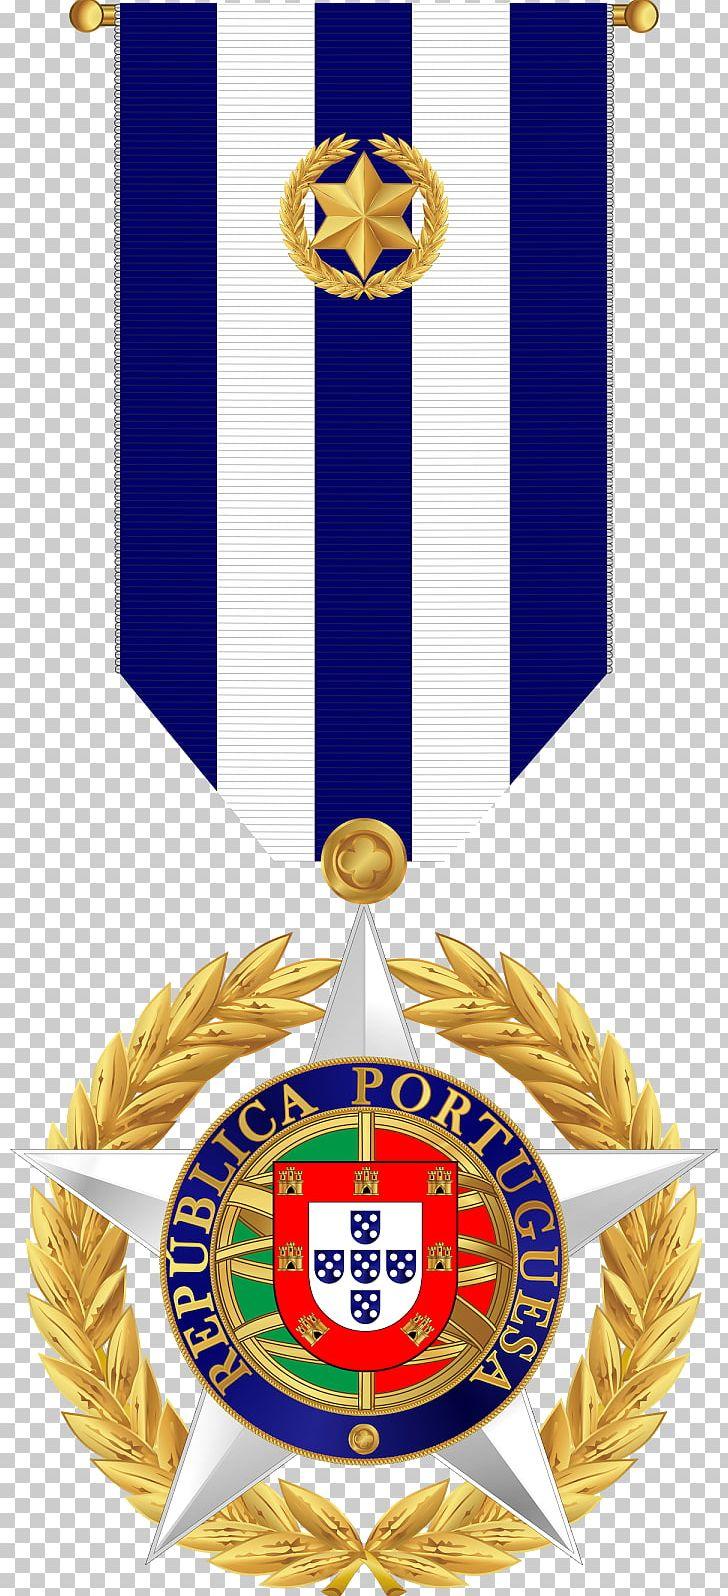 Gold Medal Military Heraldry Medalha De Mérito Militar PNG.